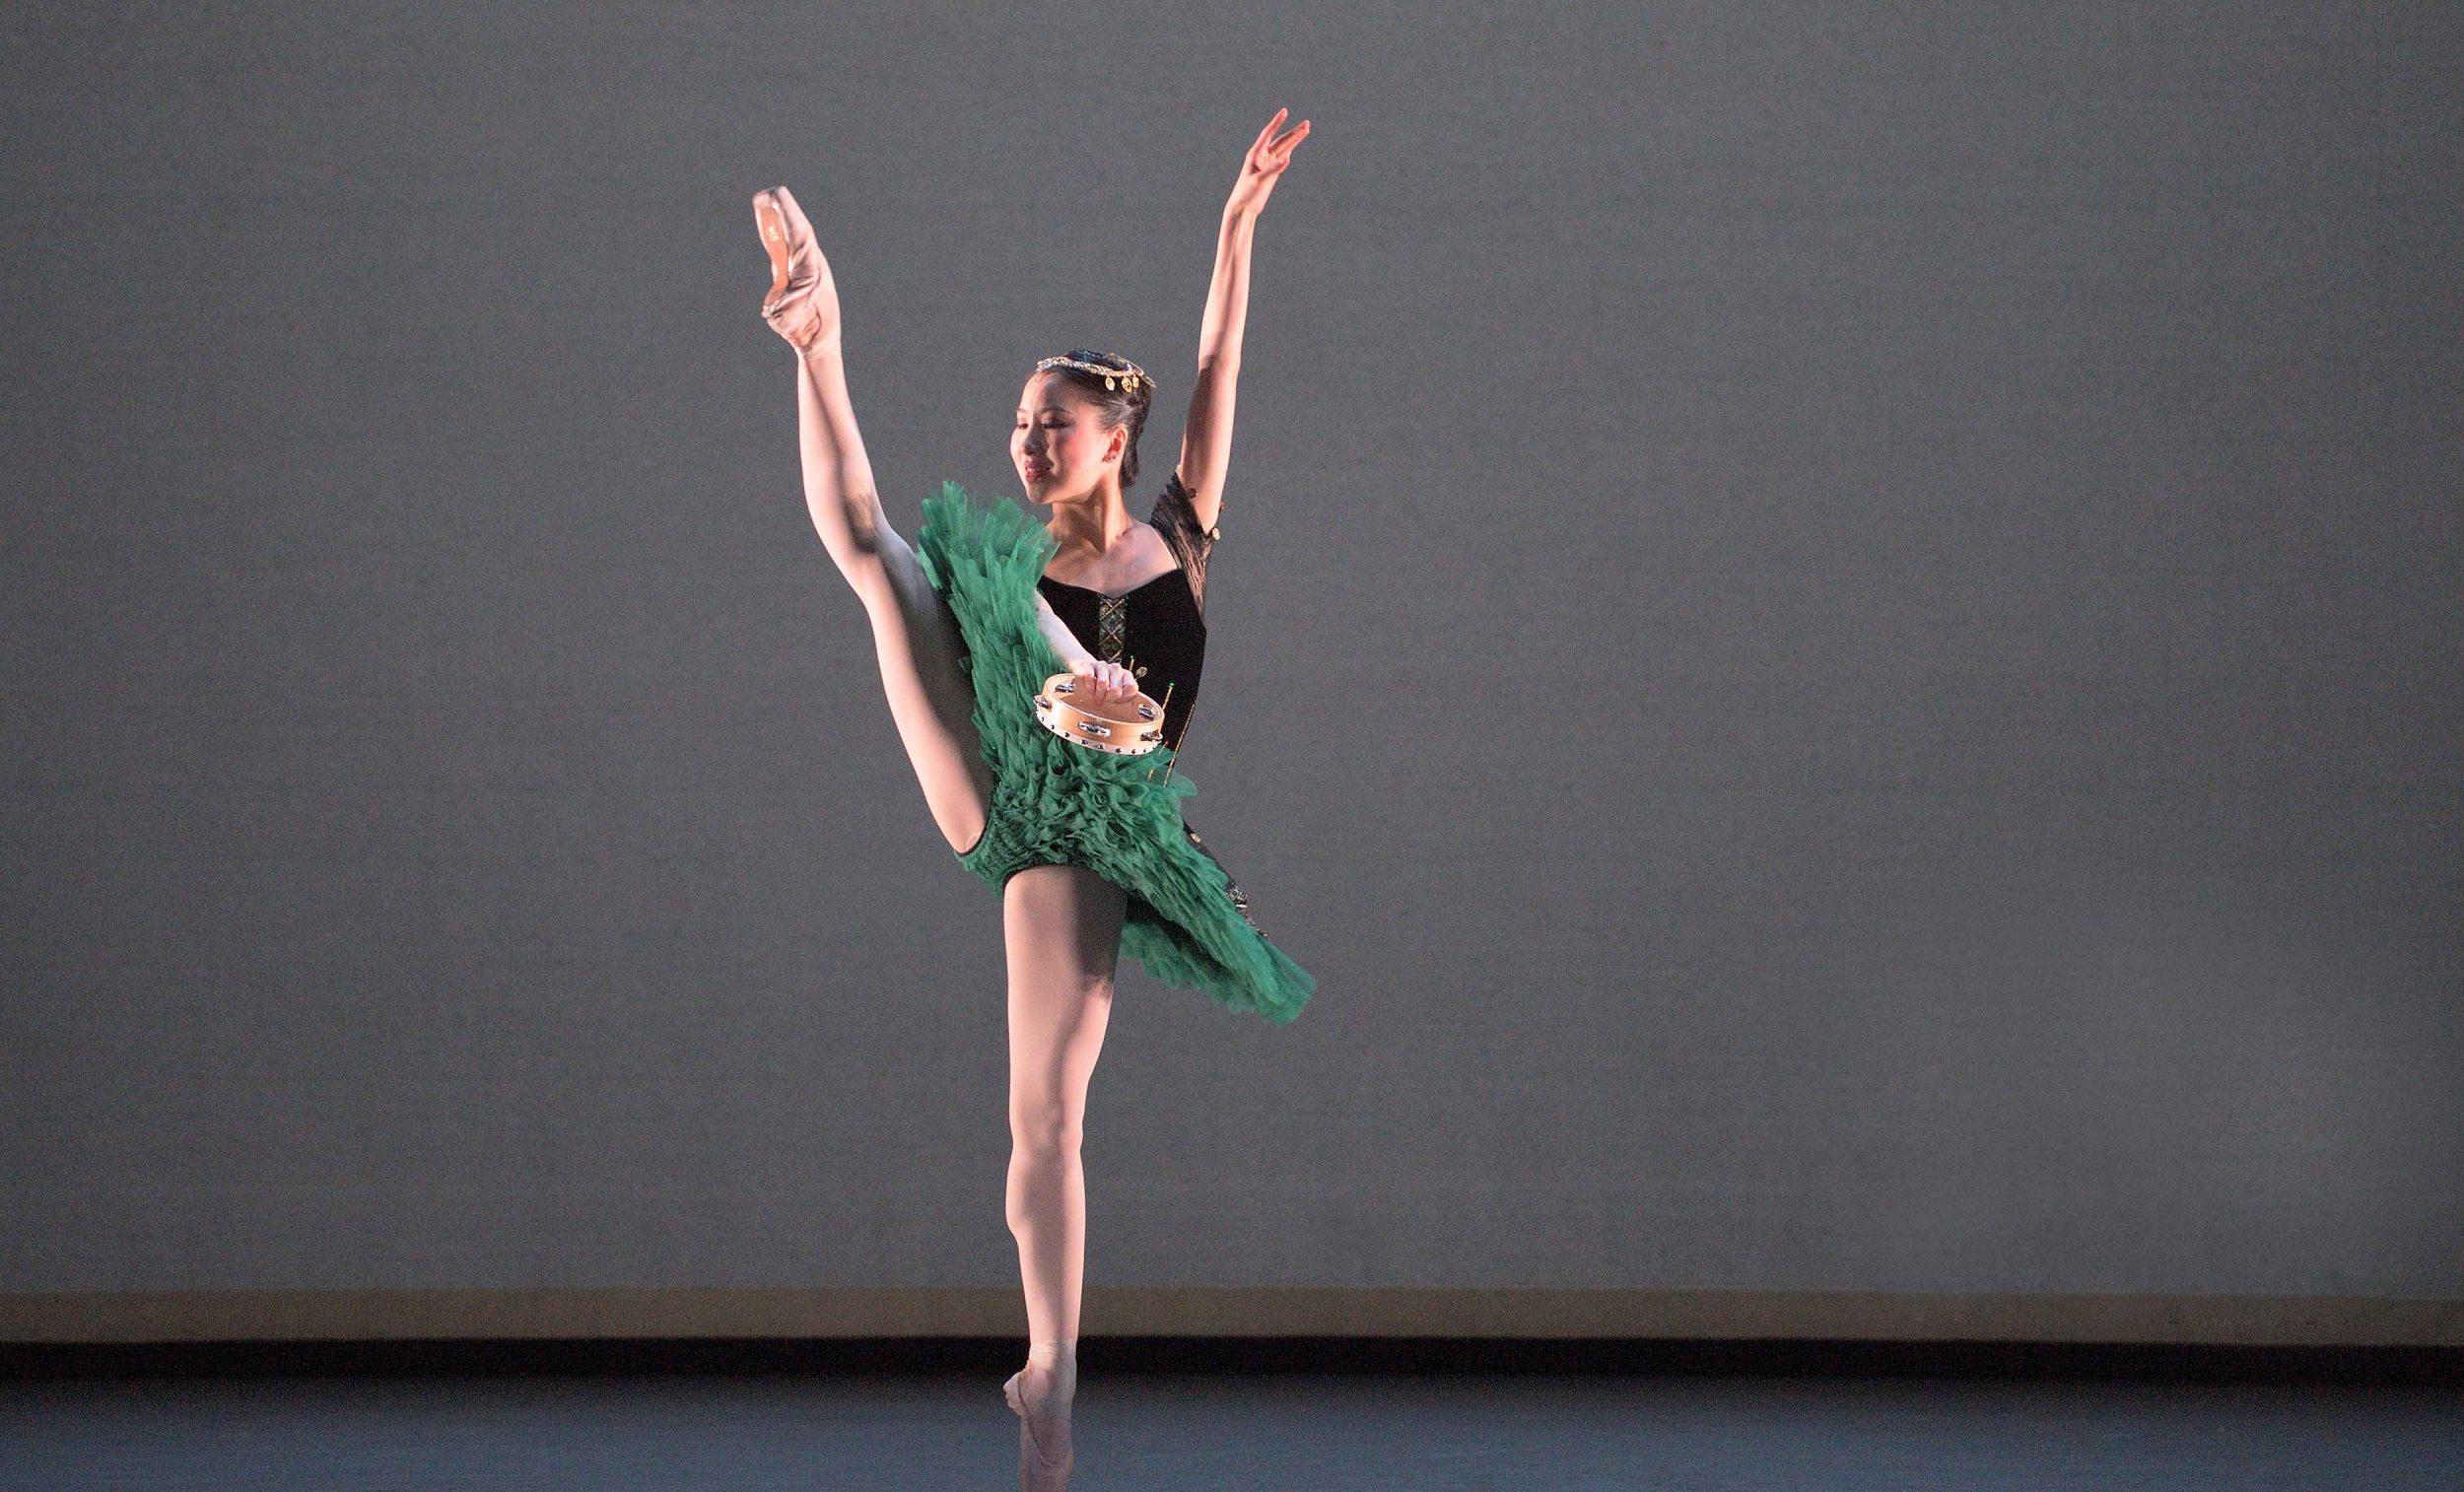 Rina-Kanehara-performing-the-Esmeralda-pas-de-deux-©-Laurent-Liotardo-(3)